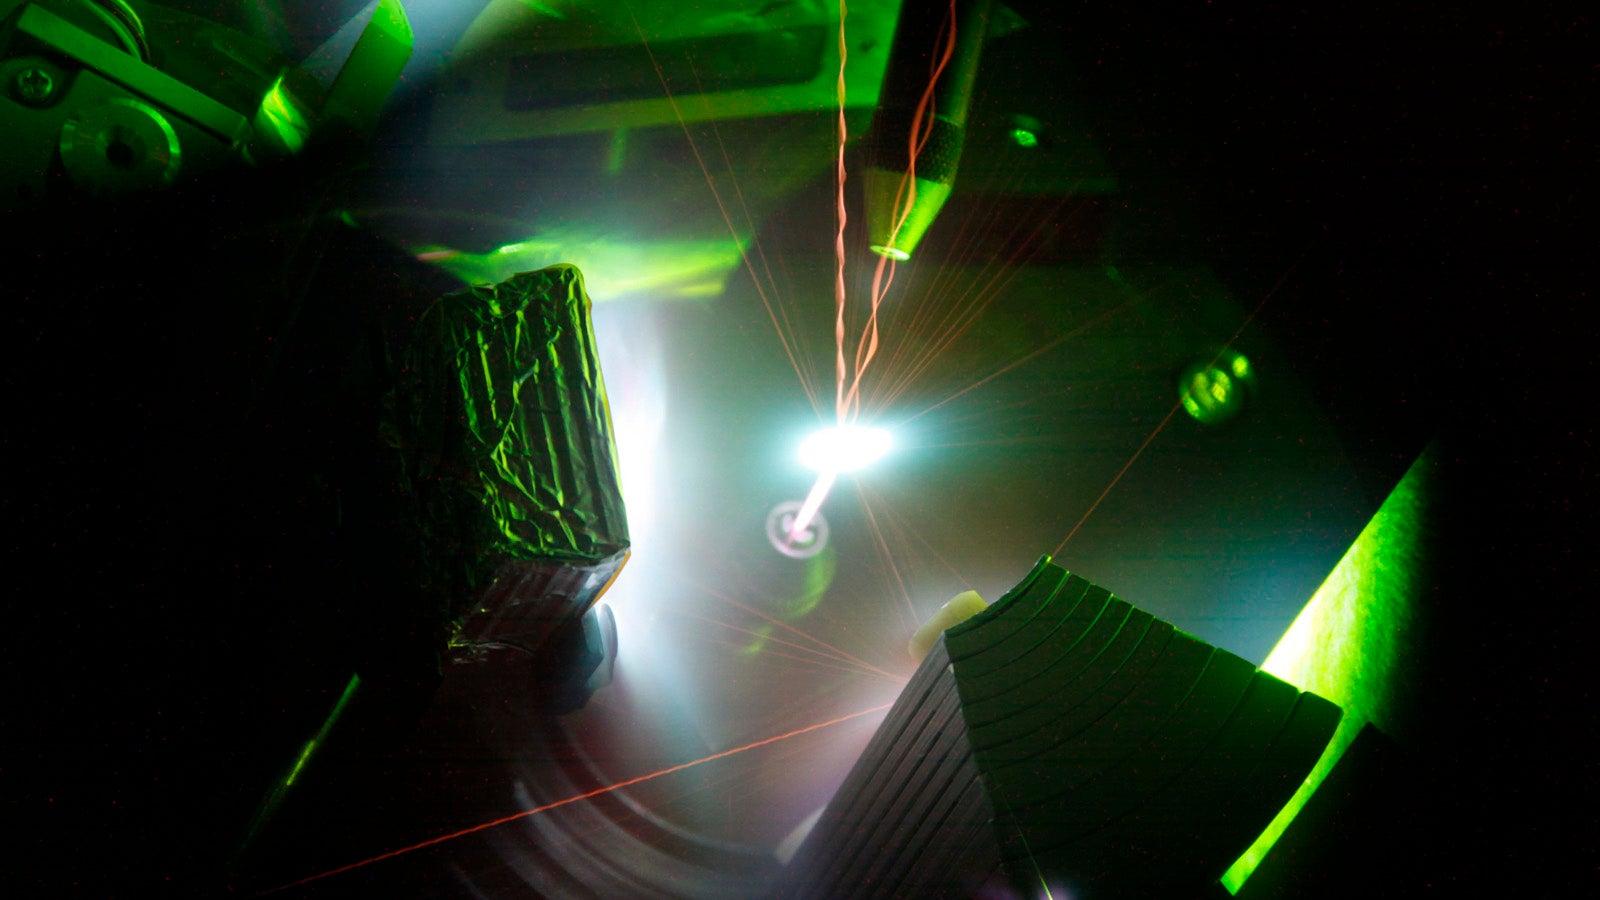 This 200-Trillion Watt Laser Produces Plasma Hotter Than The Sun